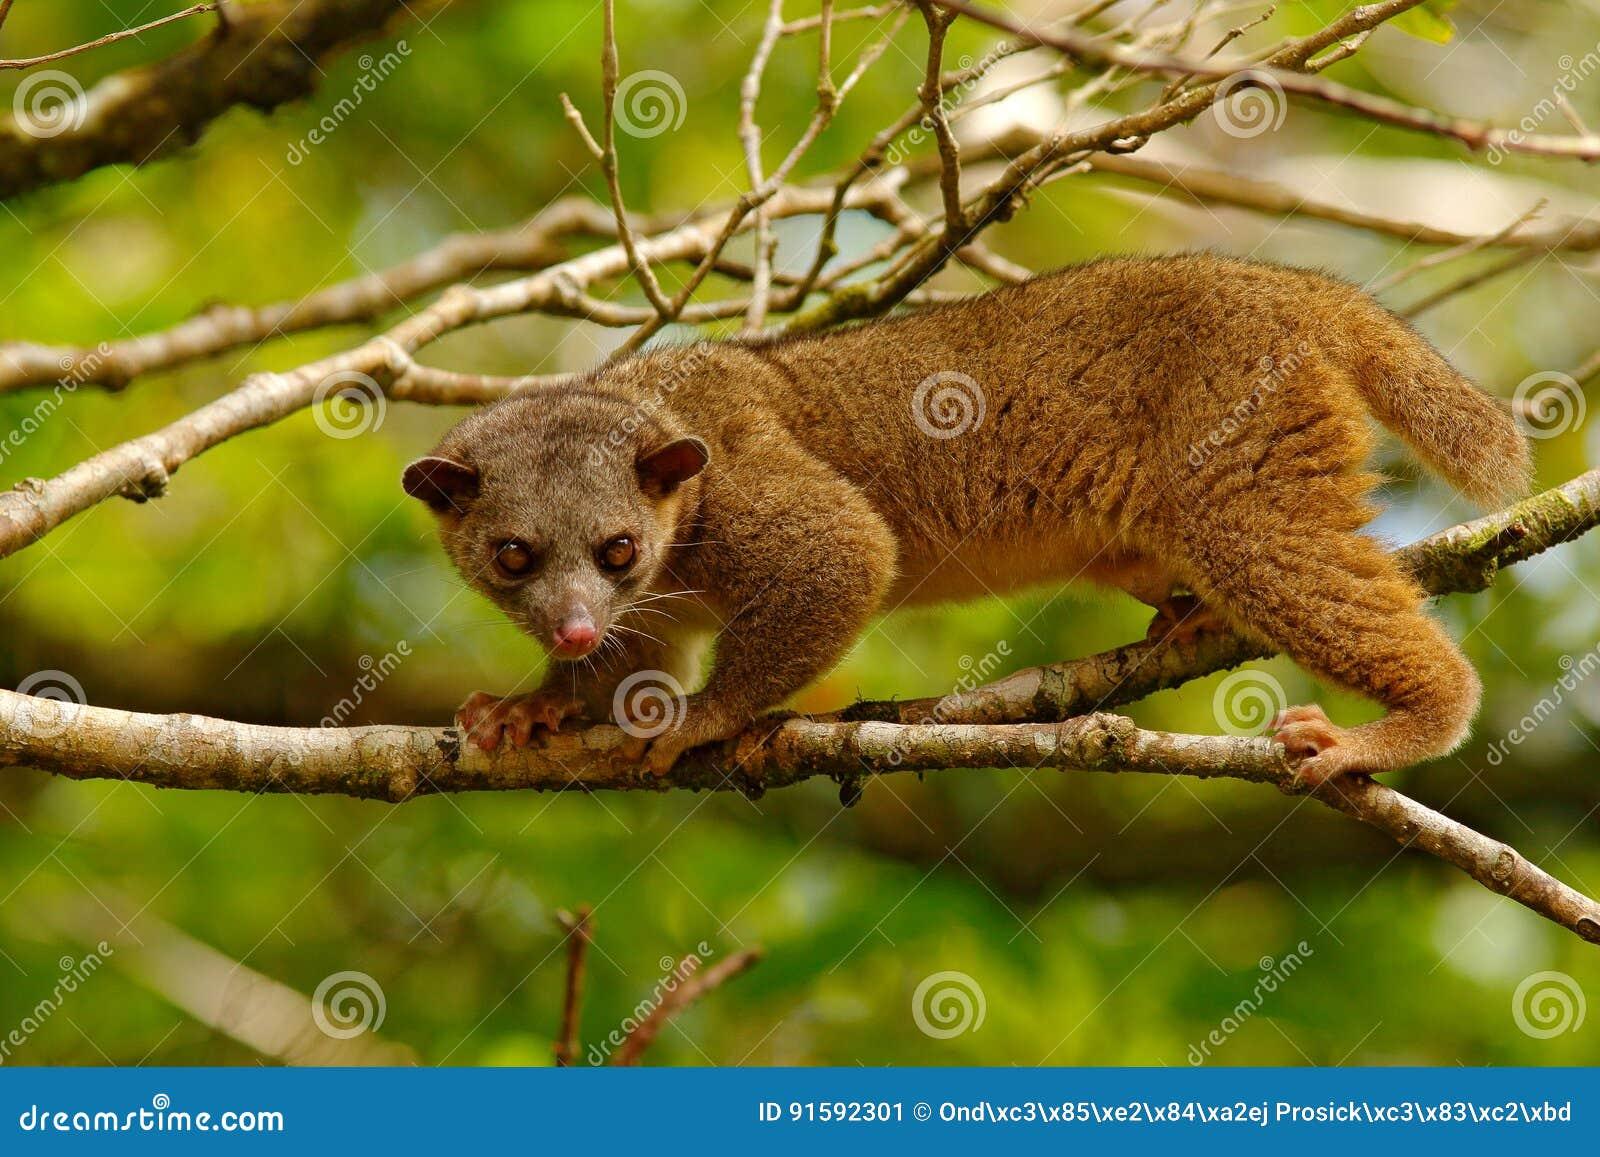 Kinkajou, Potos flavus, animal tropical dans l habitat de forêt de nature Mammifère en Costa Rica Scène de faune de nature Kinkaj